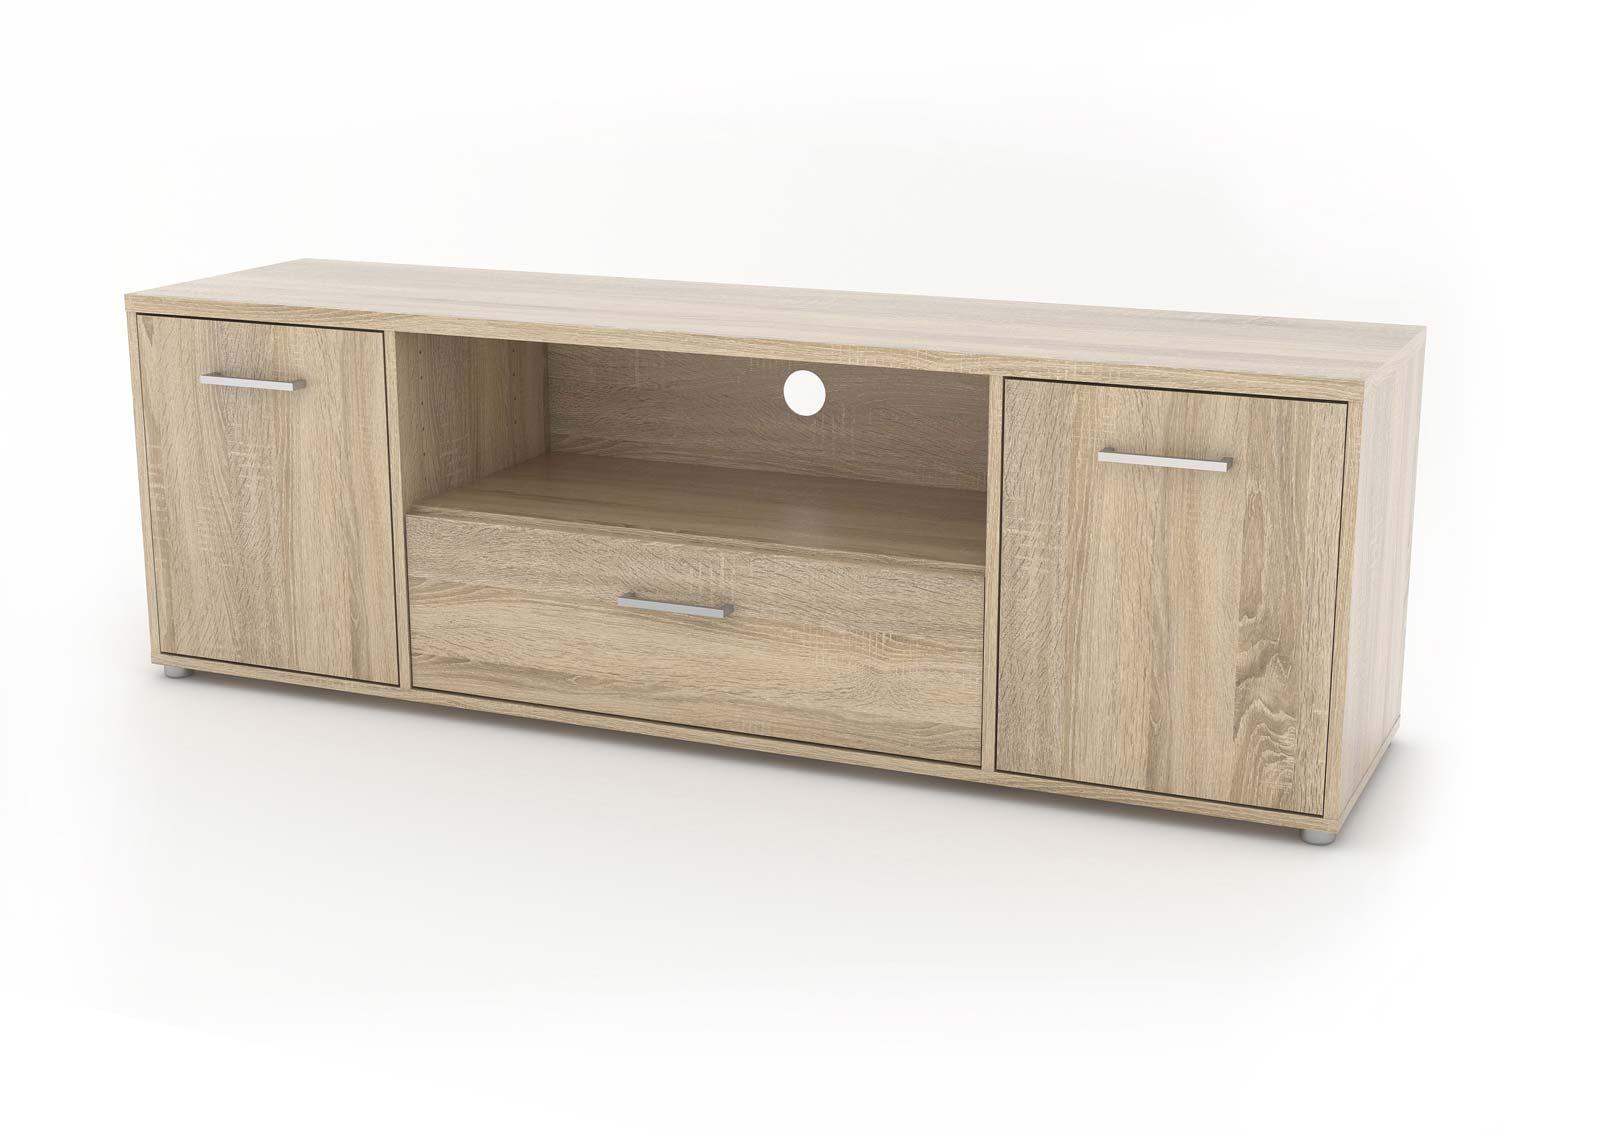 Image of   Match TV-bord med opbevaring - Eg